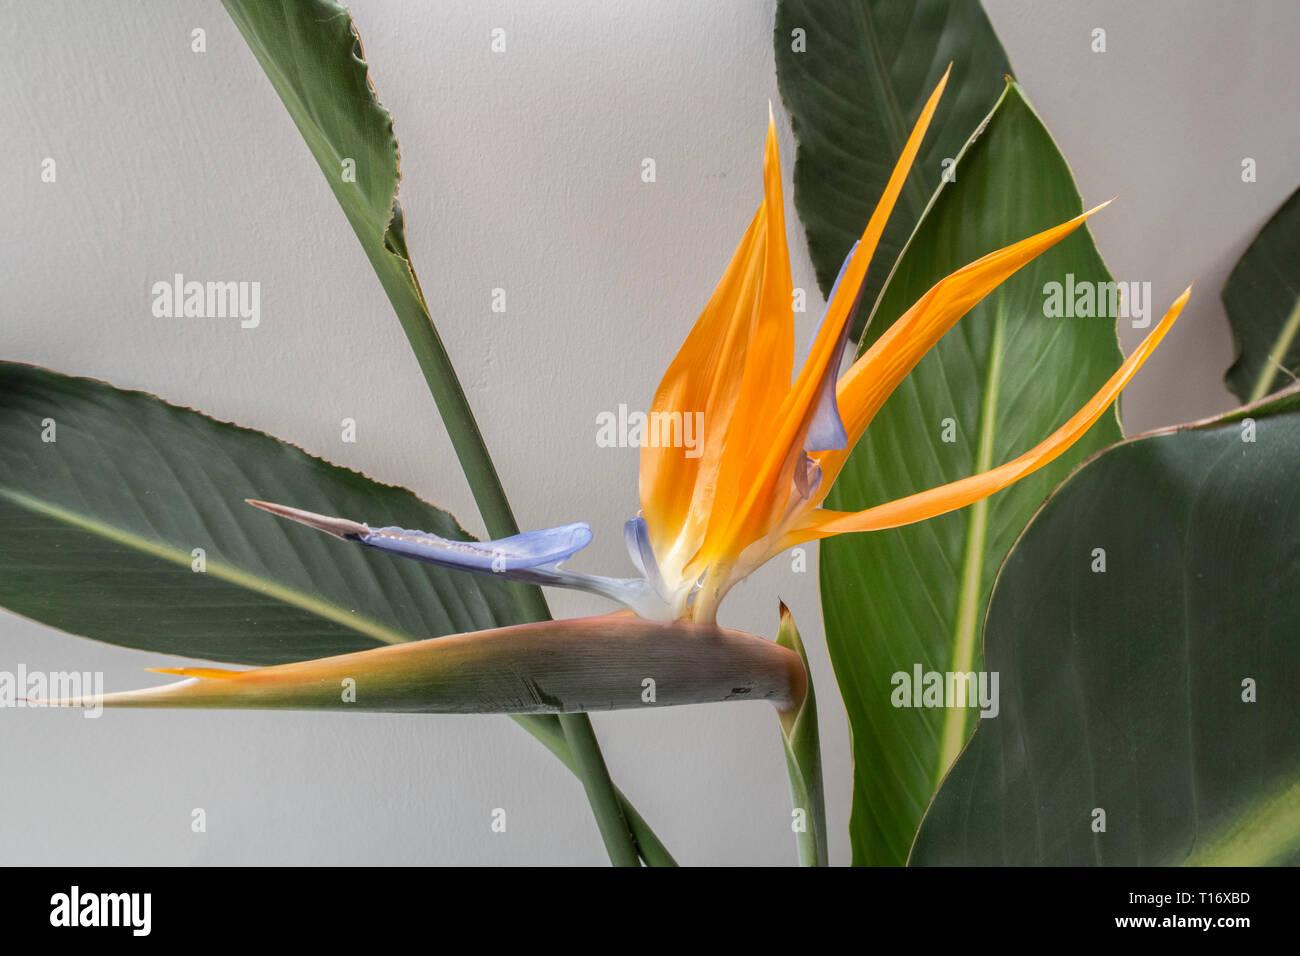 Strelitzia indoor plant in flower - bird of paradise flower. Stock Photo